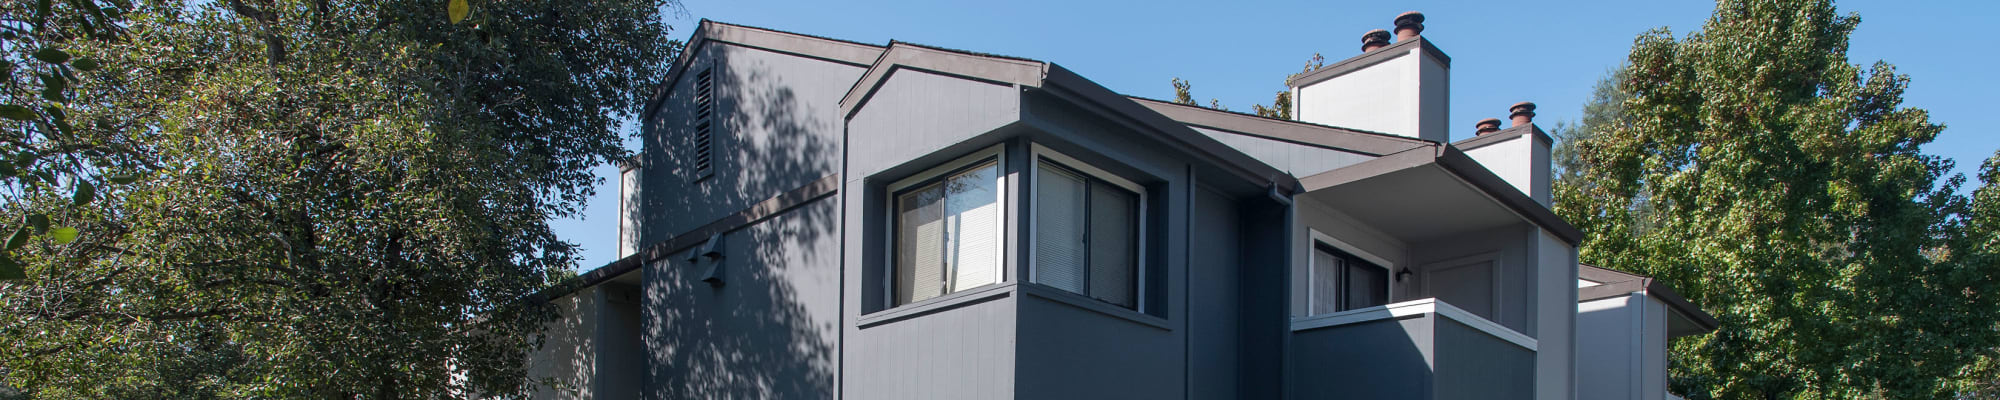 Community map at Park Ridge Apartment Homes in Rohnert Park, California